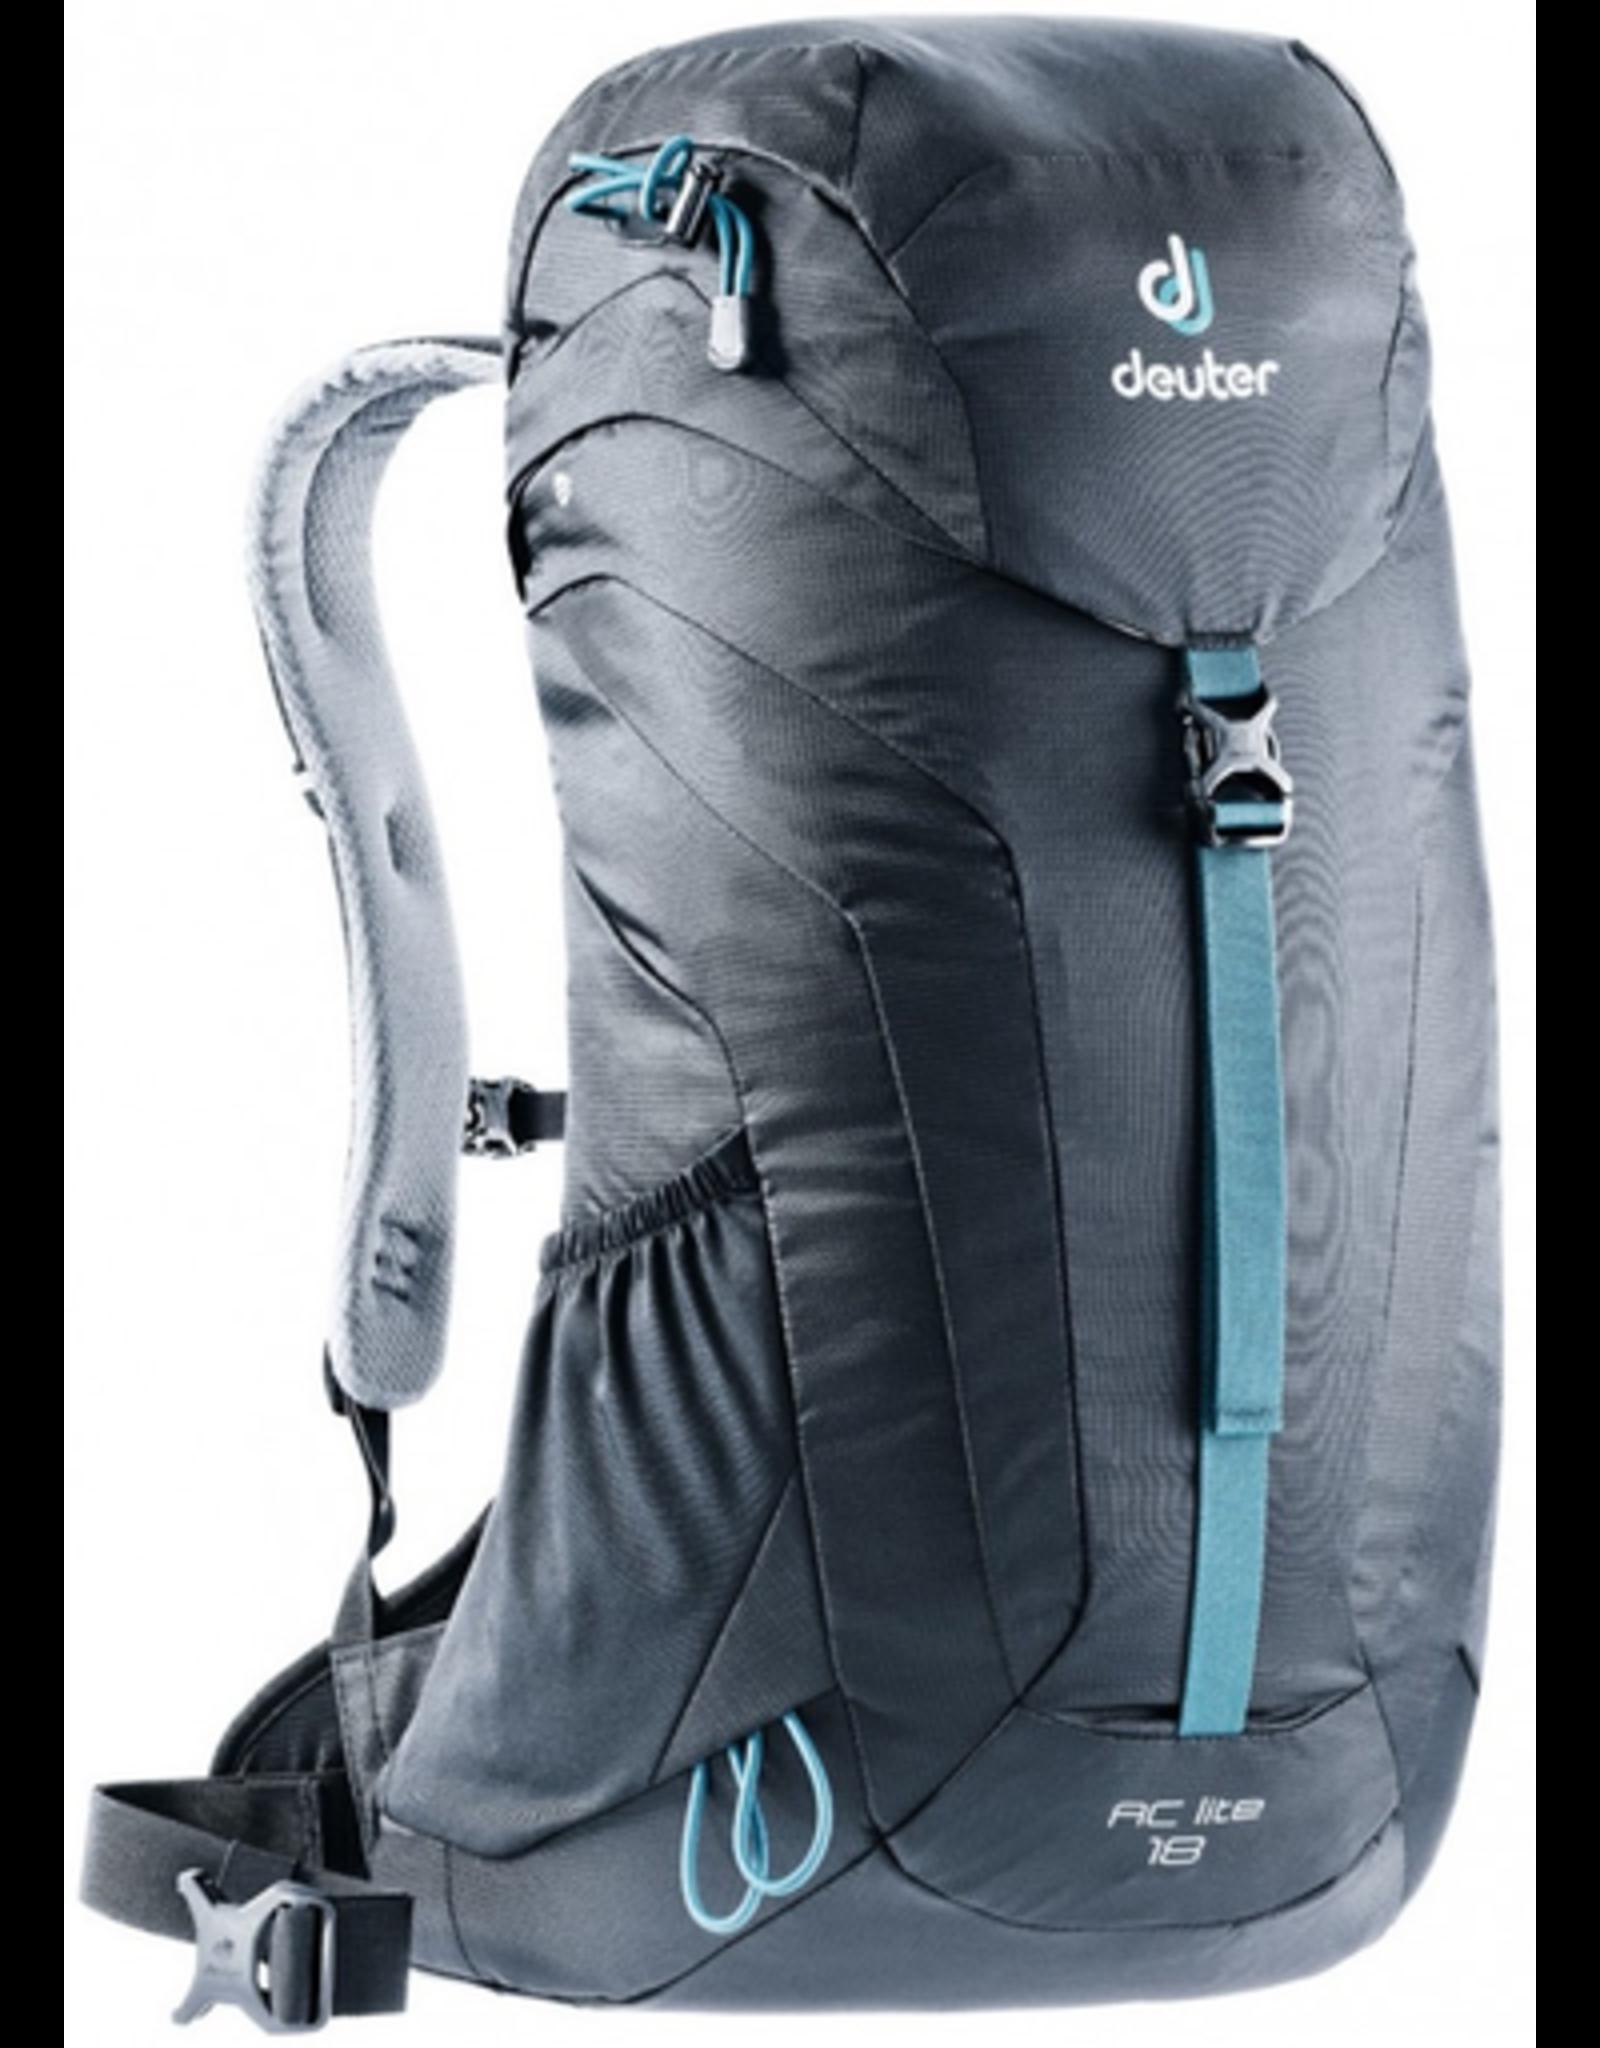 Deuter Deuter AC Lite Backpack